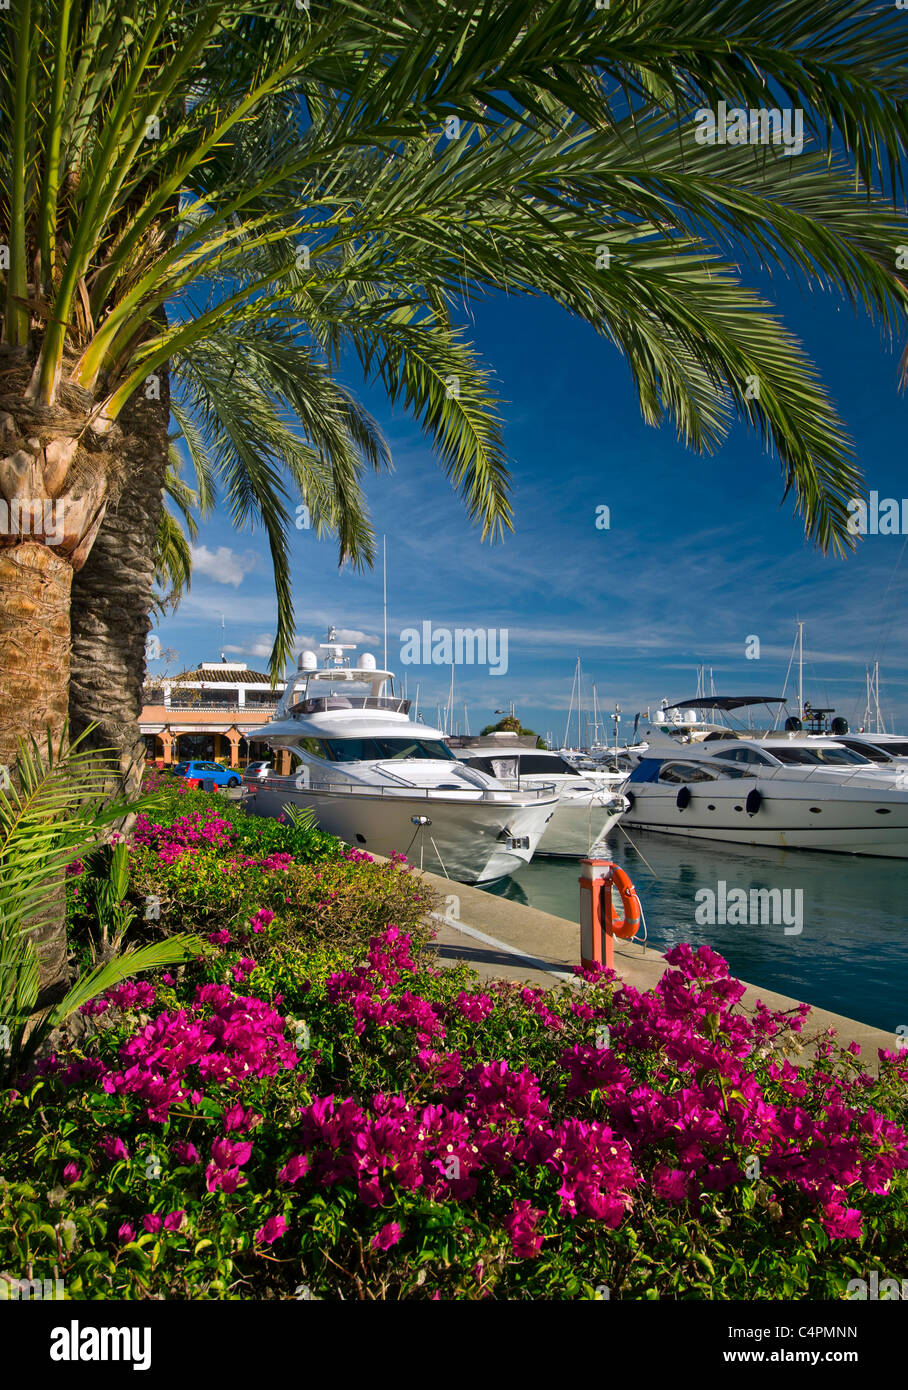 Luxury motor yachts moored at Puerto Portals marina Portals Nous Palma de Mallorca Balearic Islands Spain - Stock Image